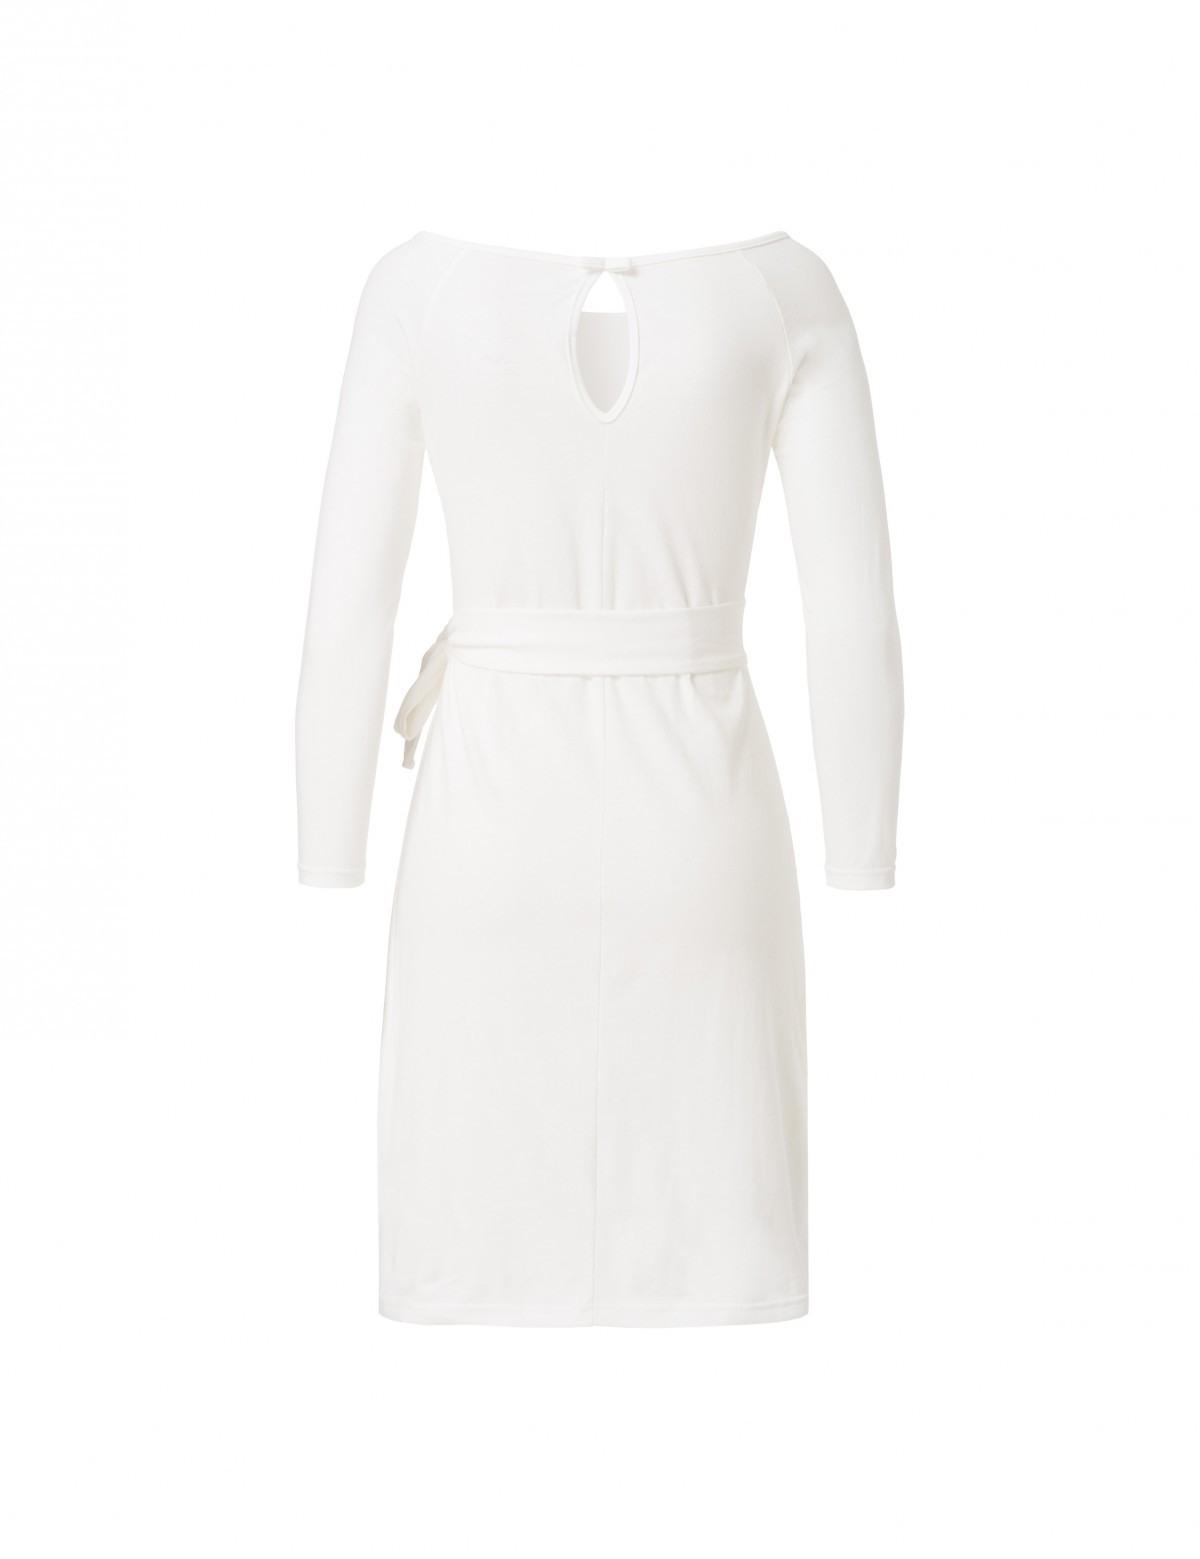 Formal Kreativ Weißes Kleid Langarm Stylish13 Kreativ Weißes Kleid Langarm Galerie